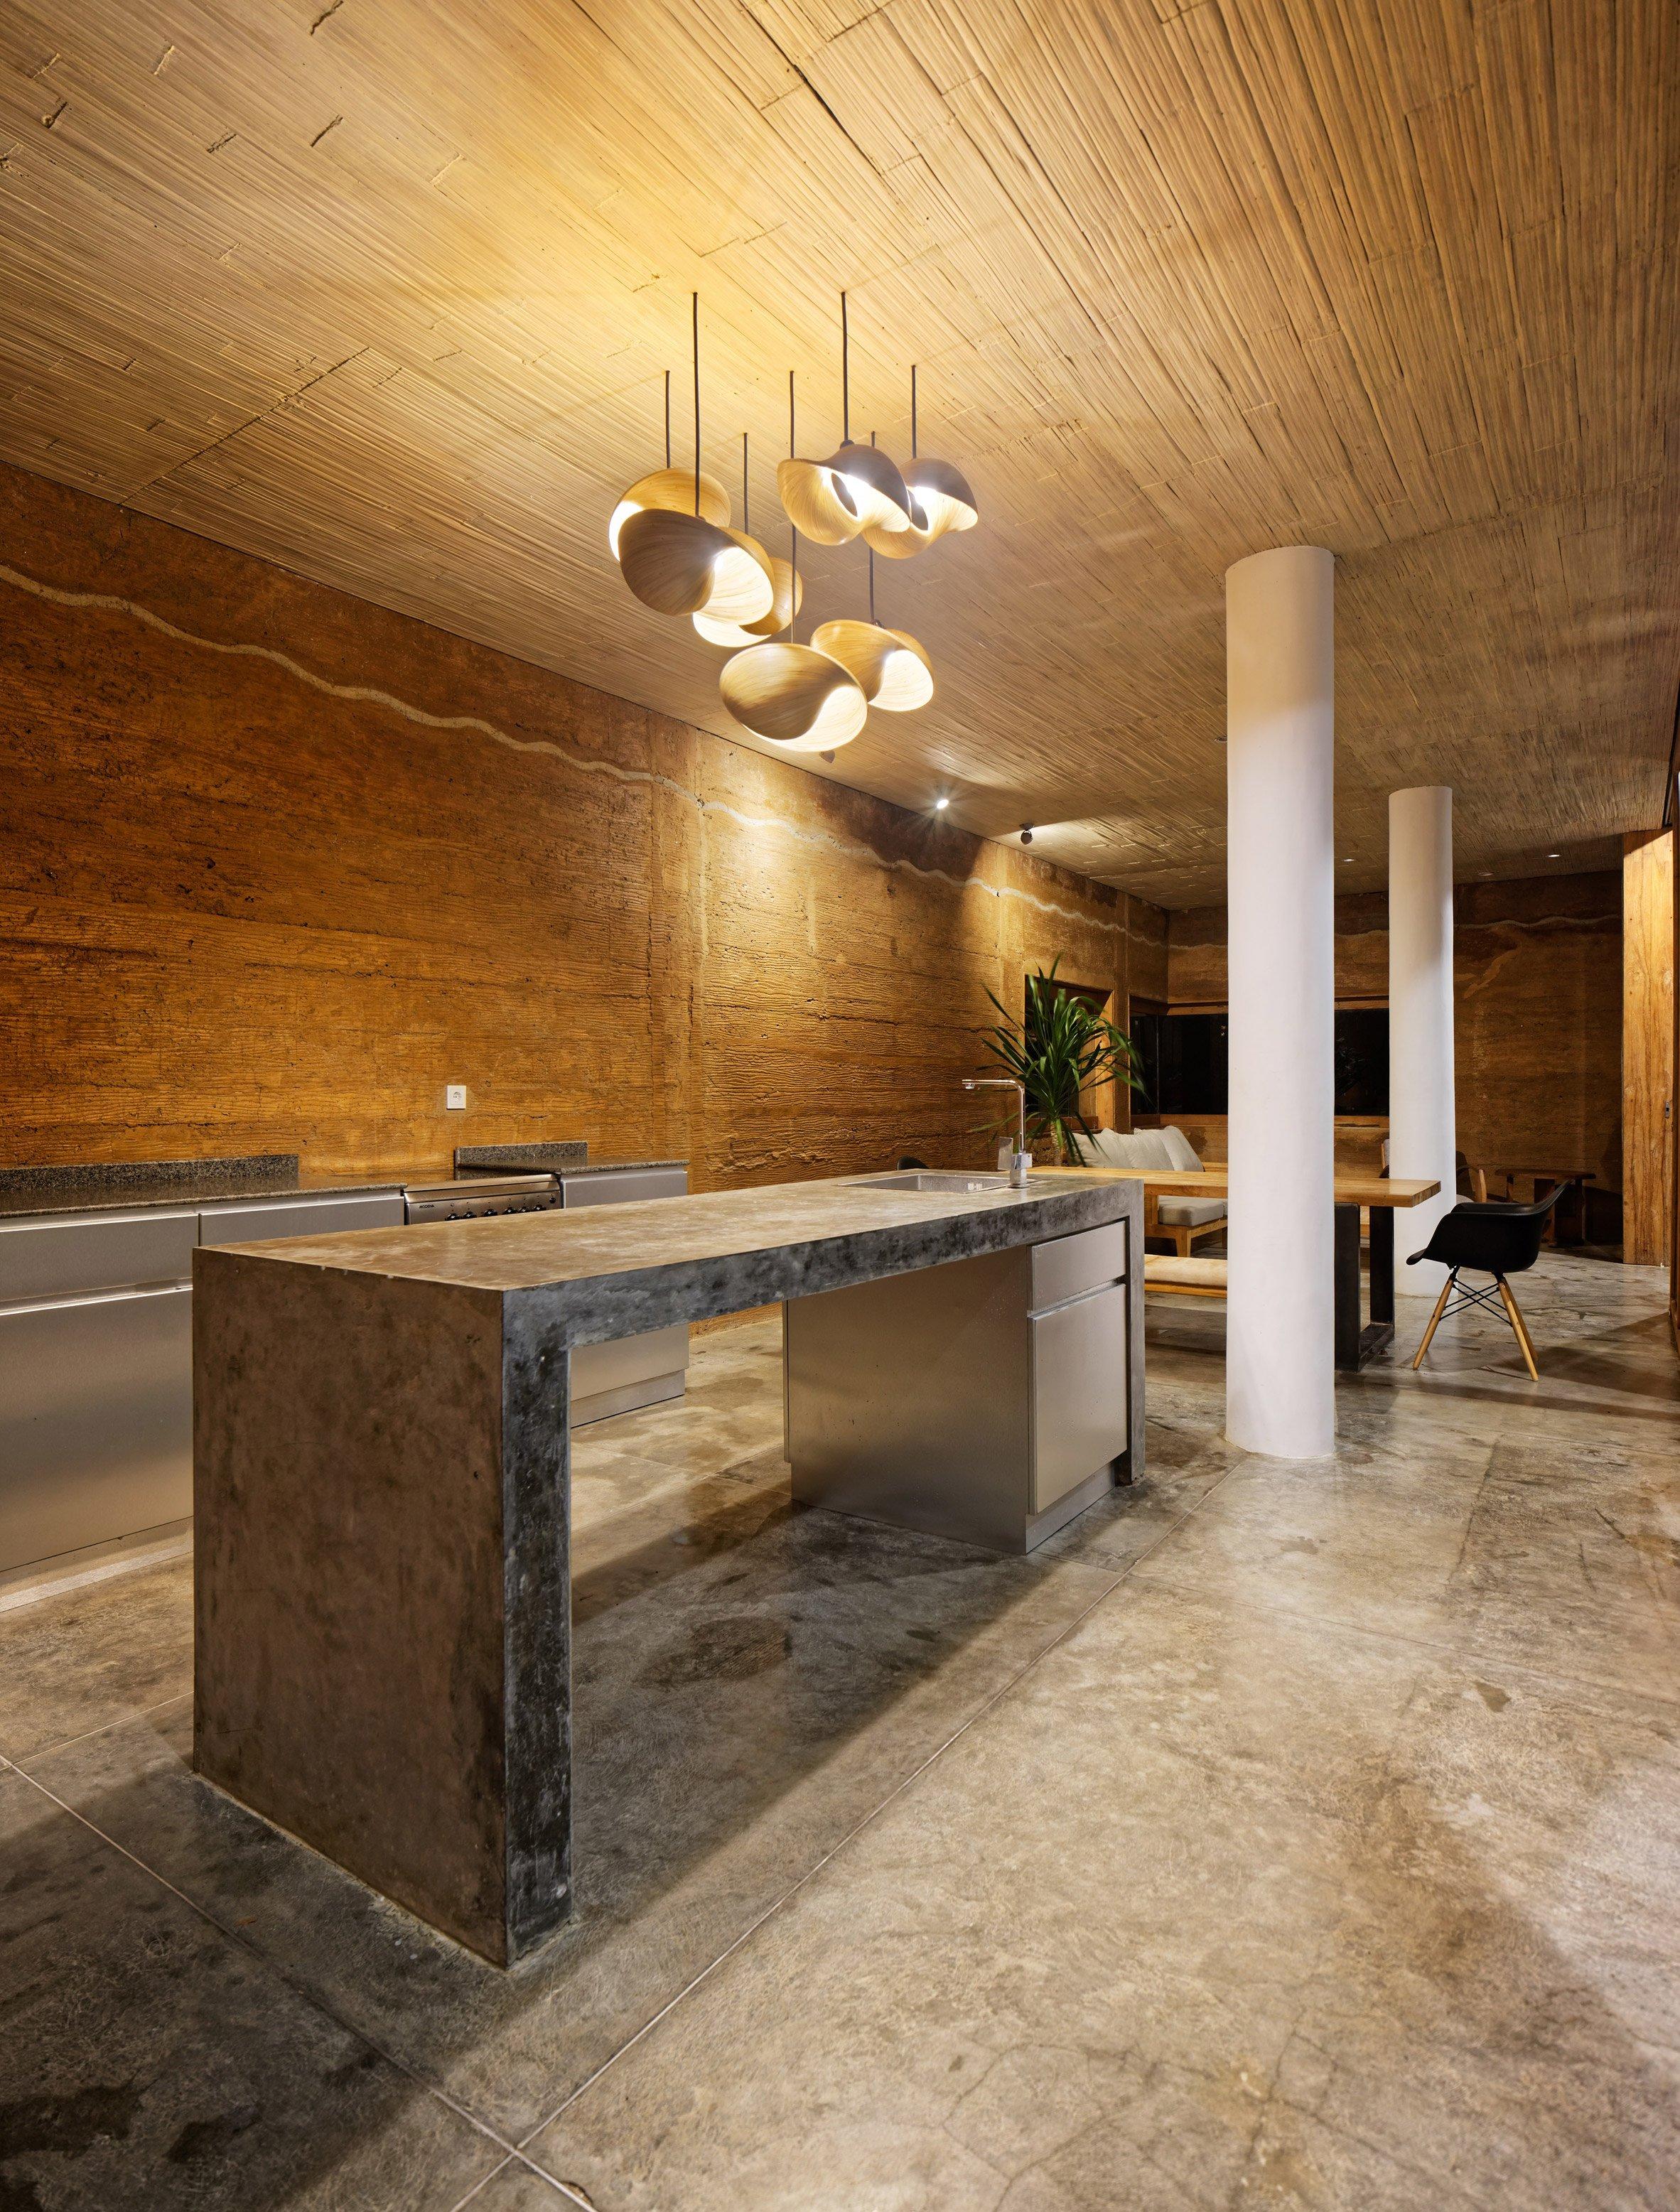 clay-house-budi-pradono-architects-architecture_dezeen_2364_col_10-1704x2244.jpg